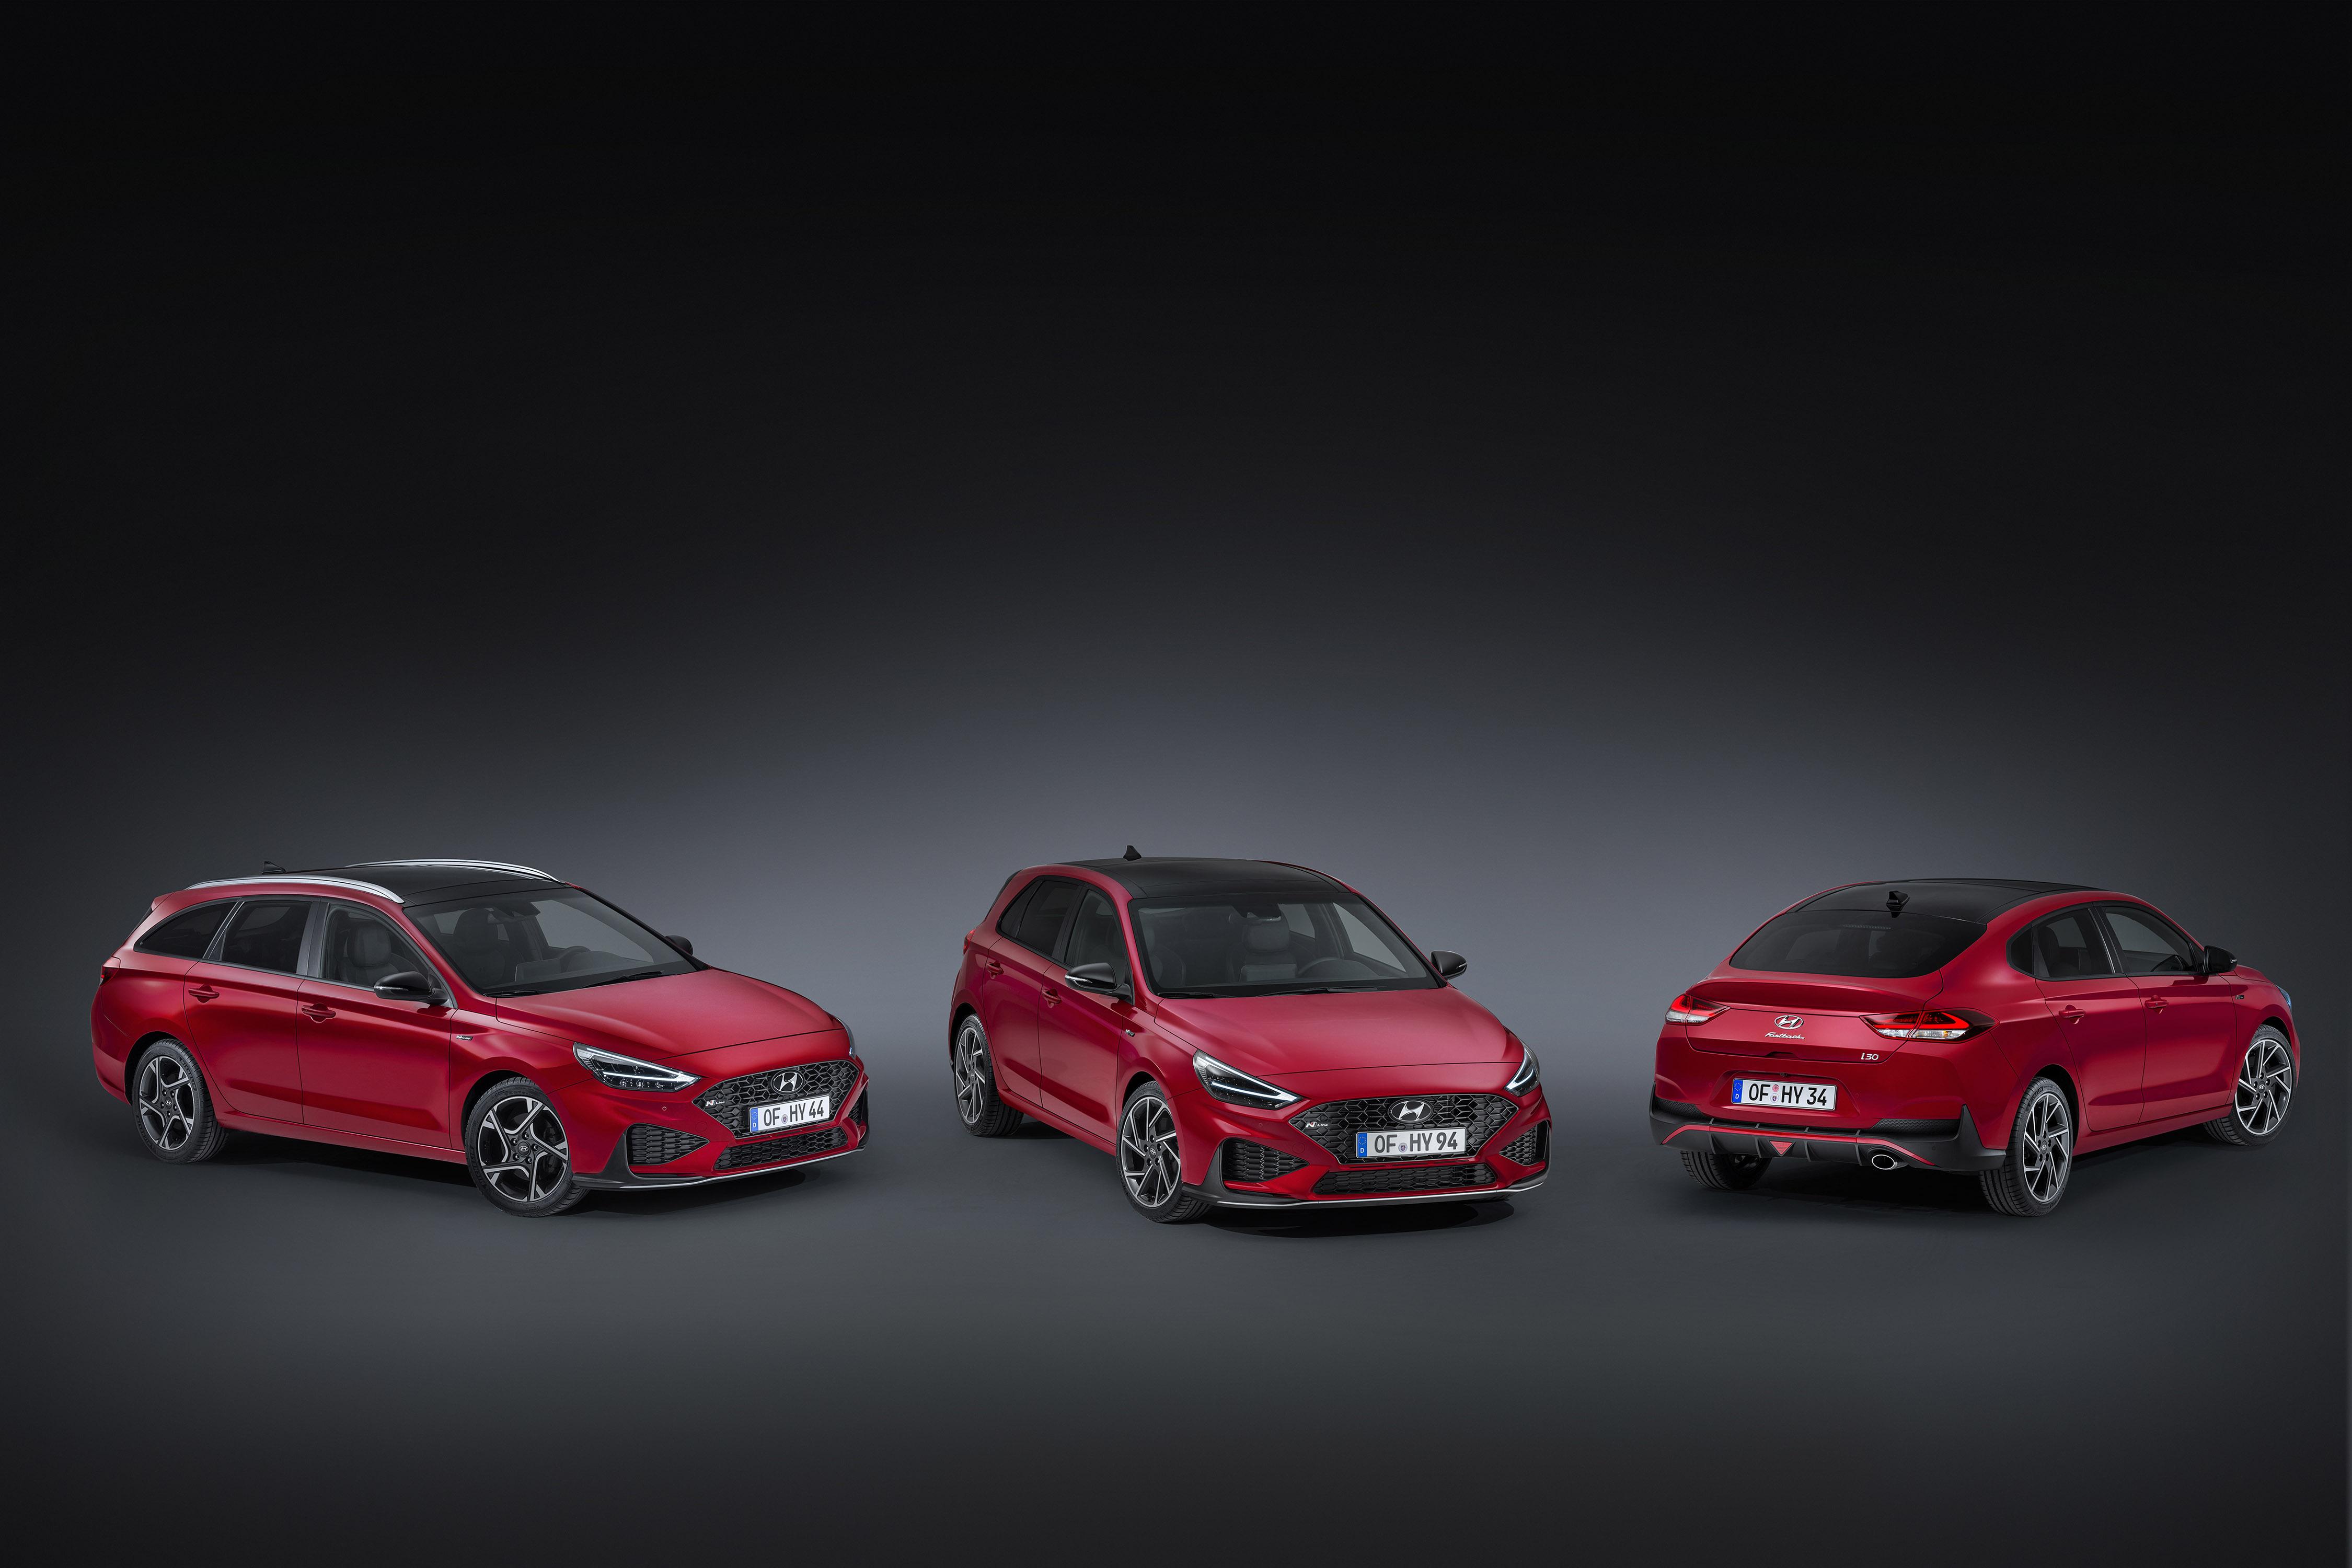 Vernieuwde Hyundai i30: slanker, veiliger en efficiënter